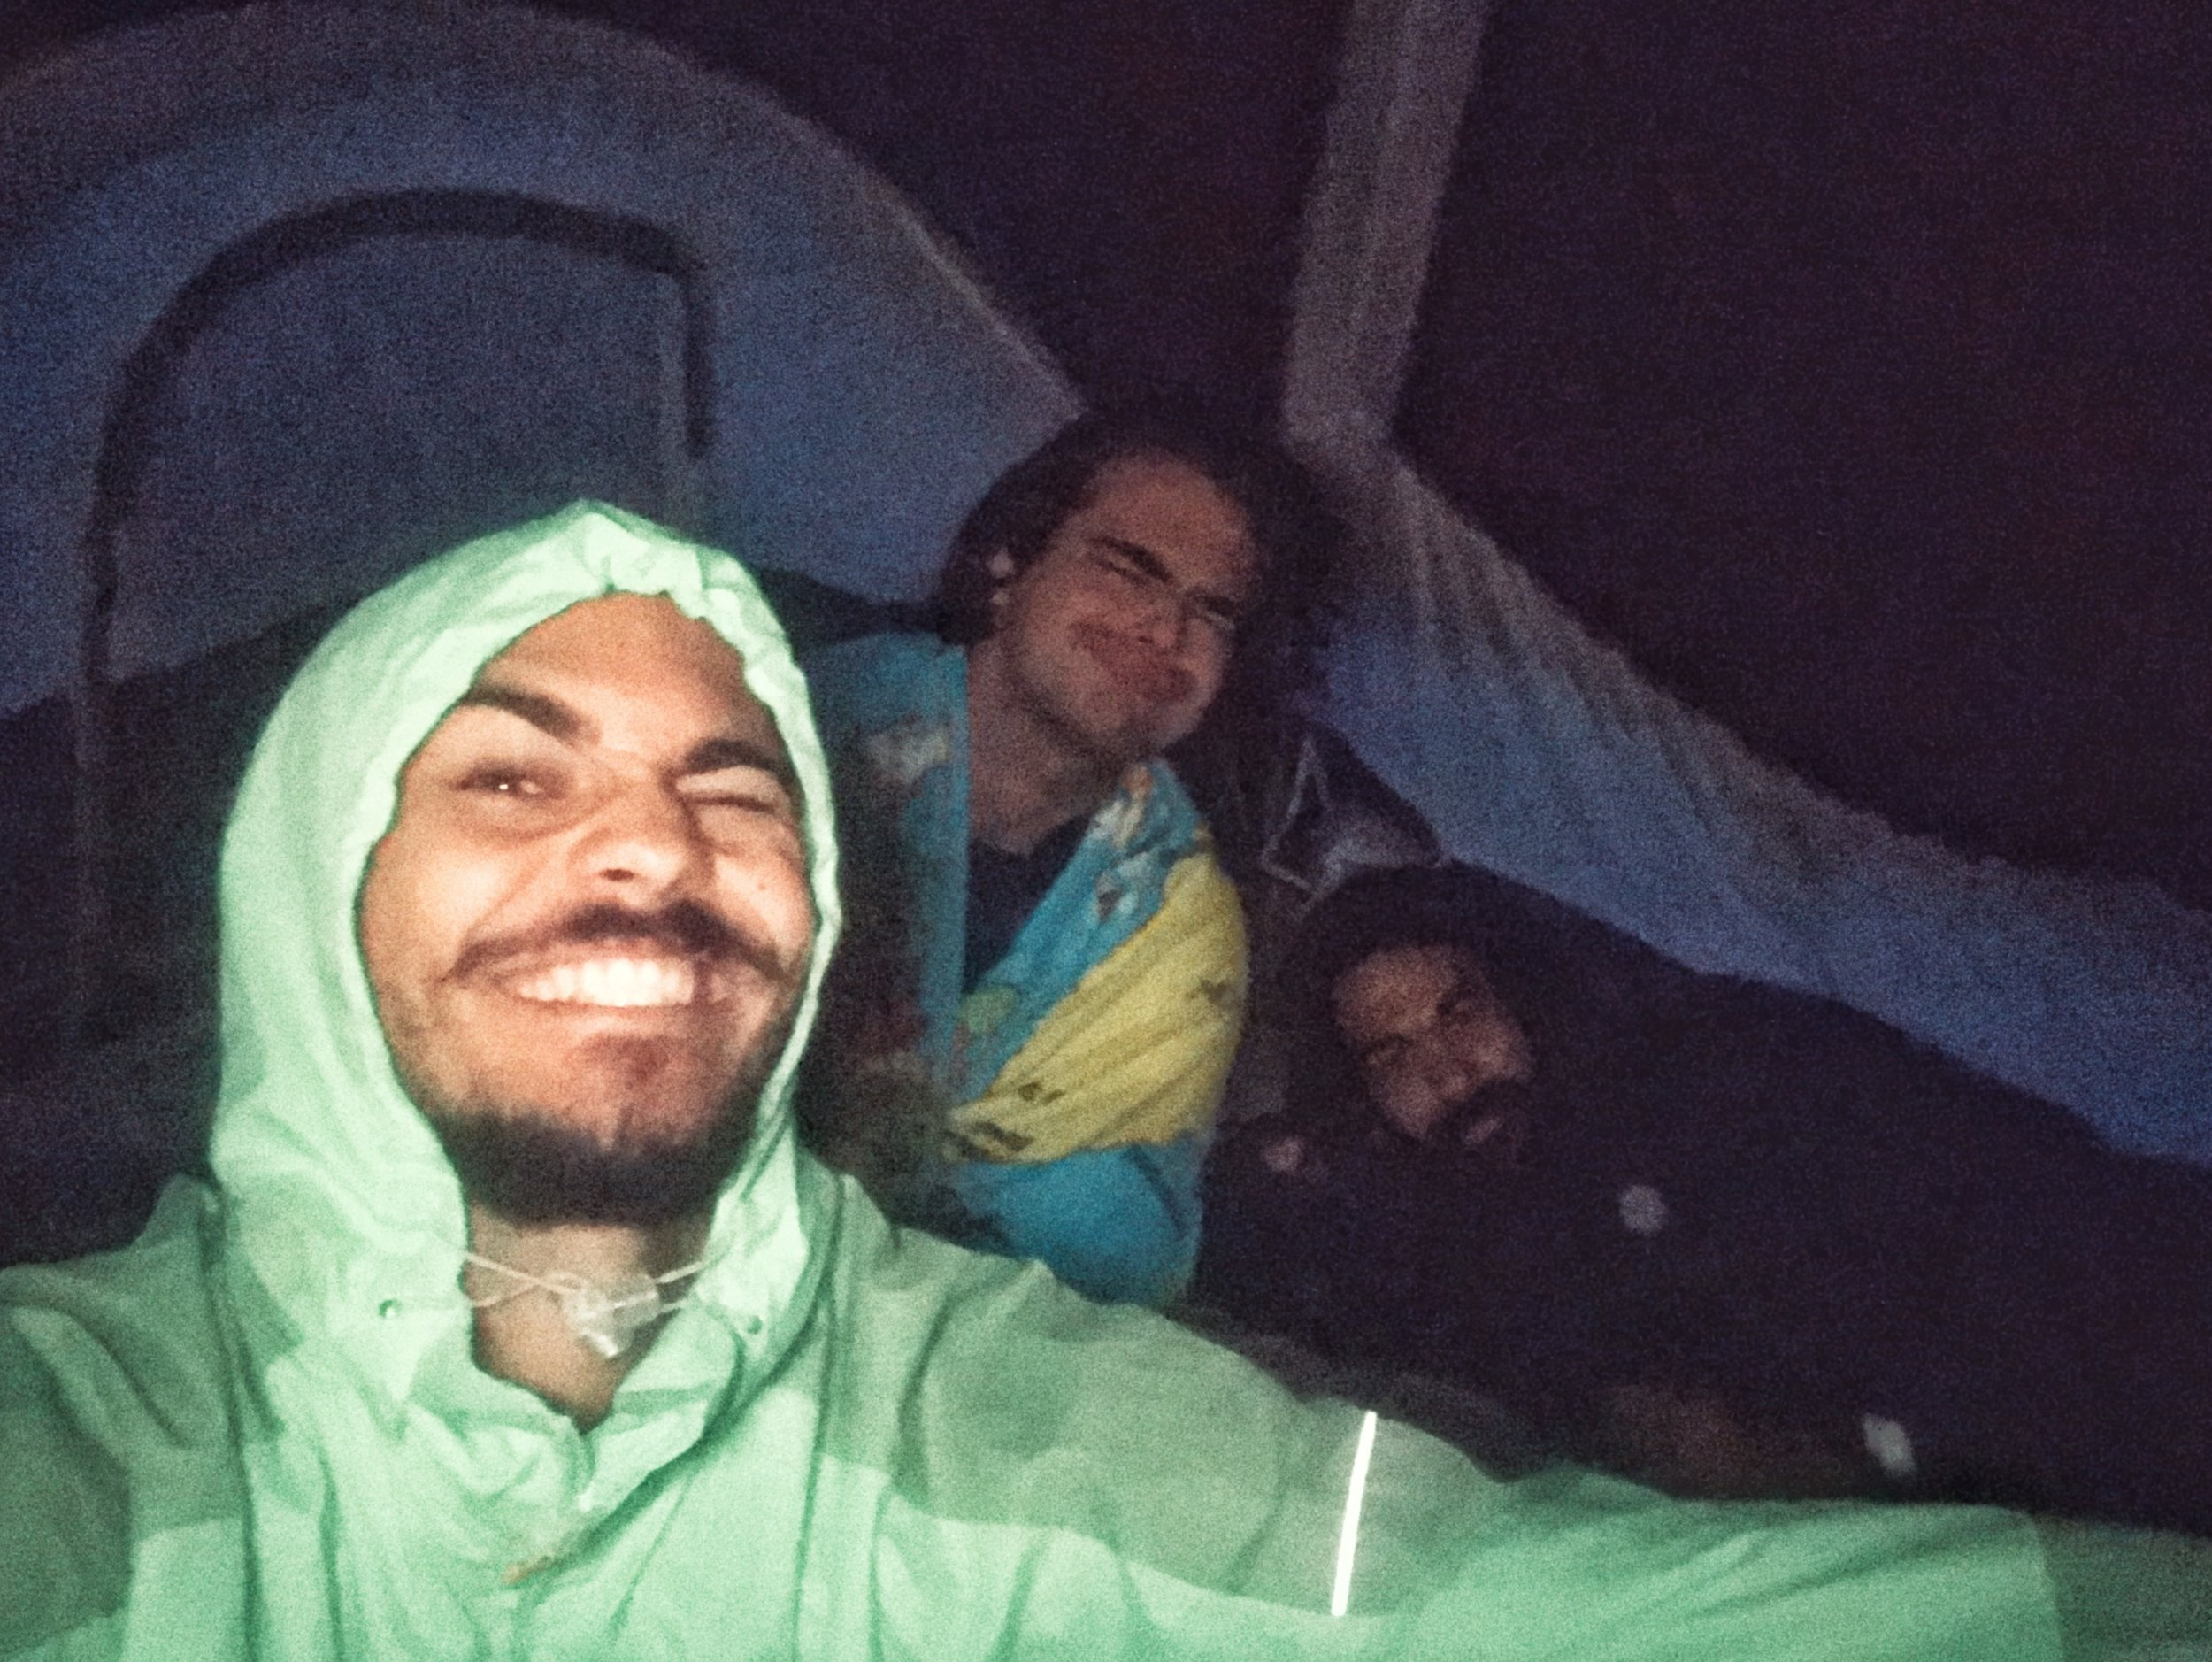 Wind , Rain and Smiles. 05.10.18, 05:35am , La Soufriere Crater.